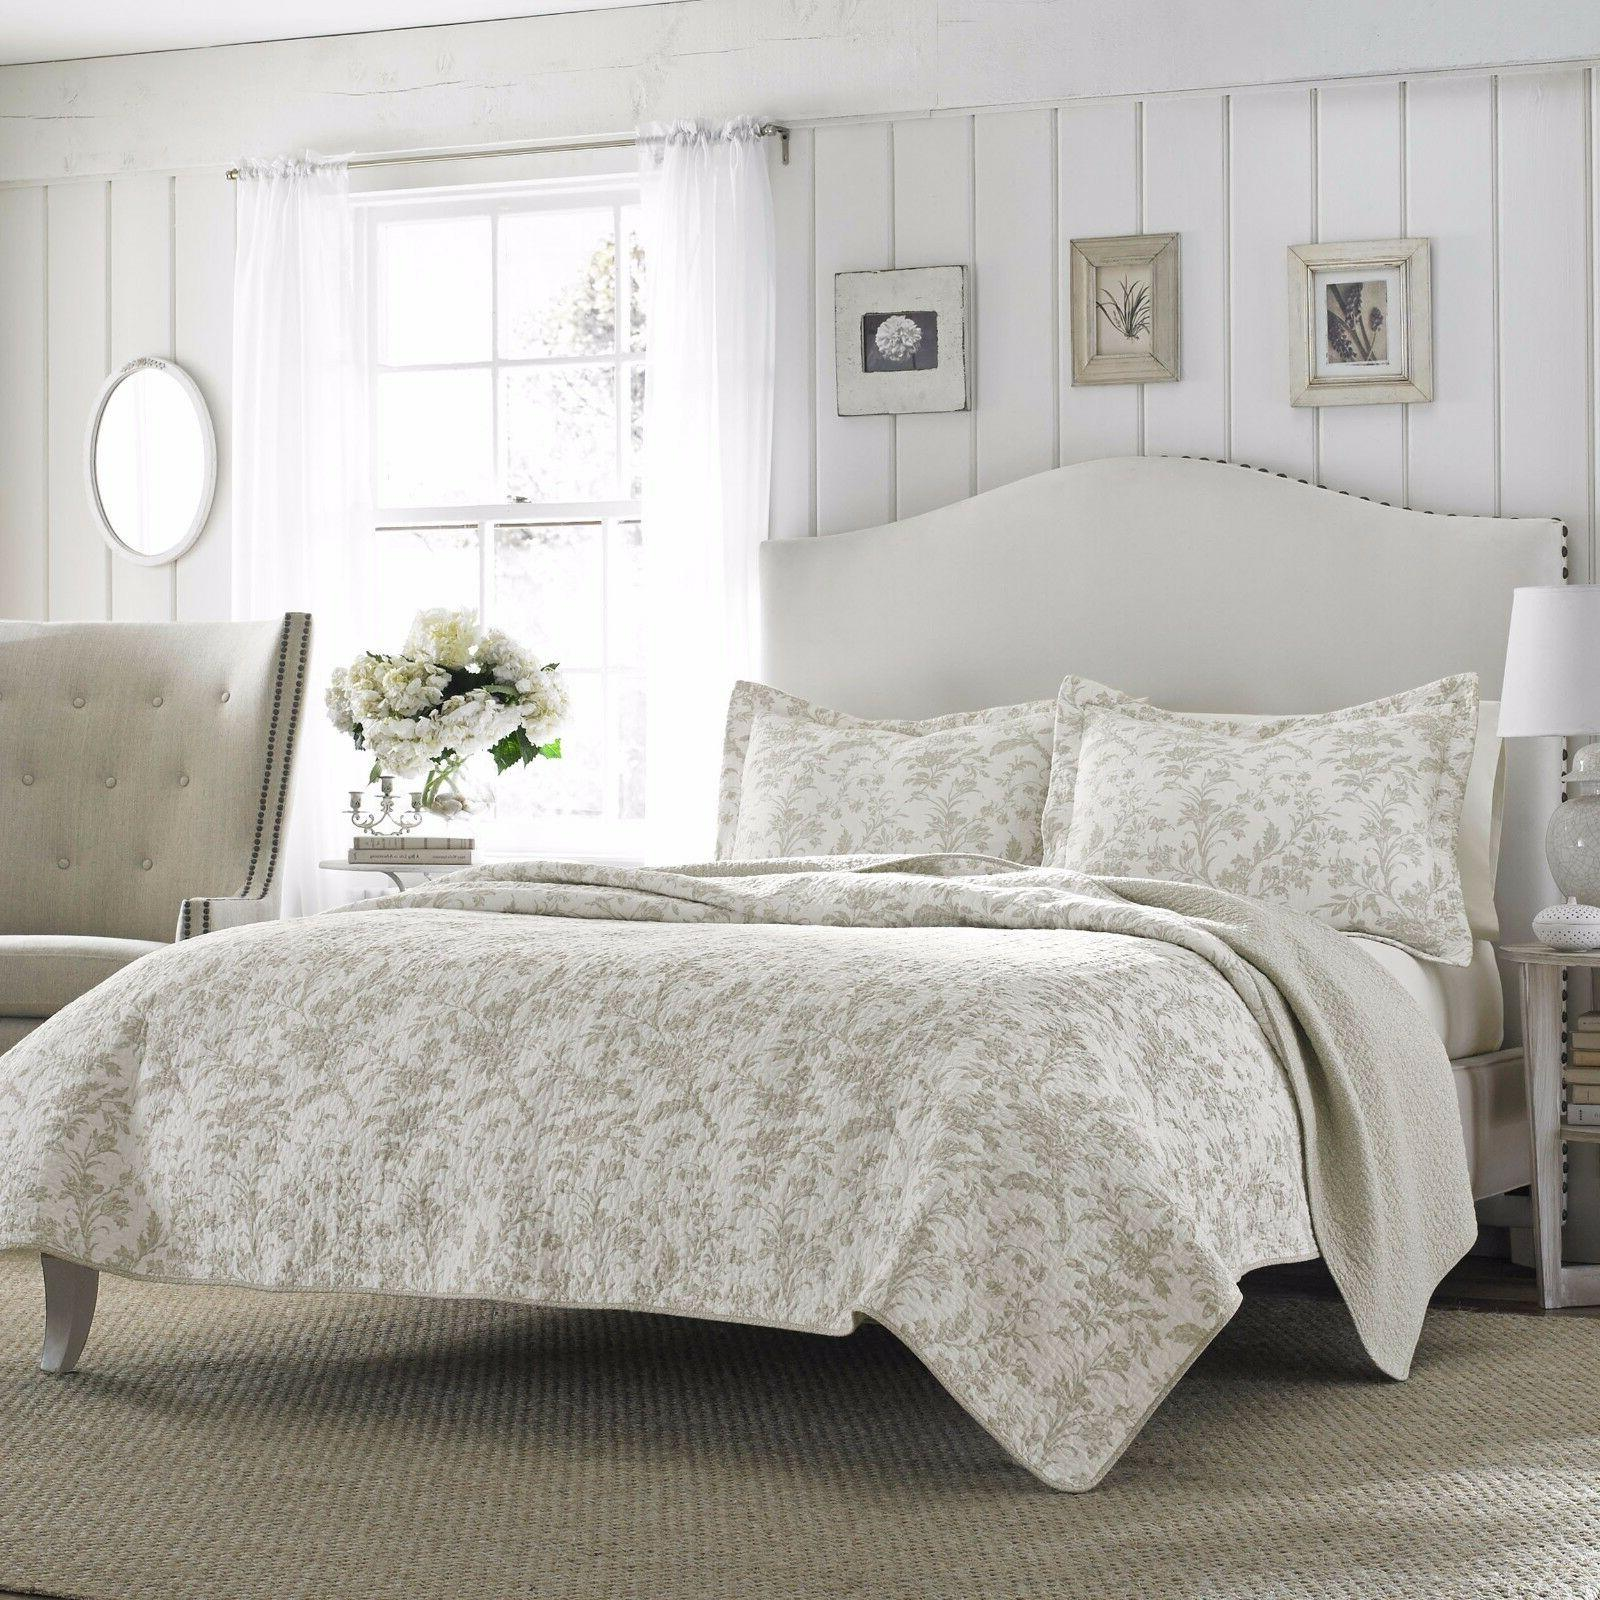 3pc LAURA ASHLEY Cotton Coverlet Quilt Set KING Size REVERSI